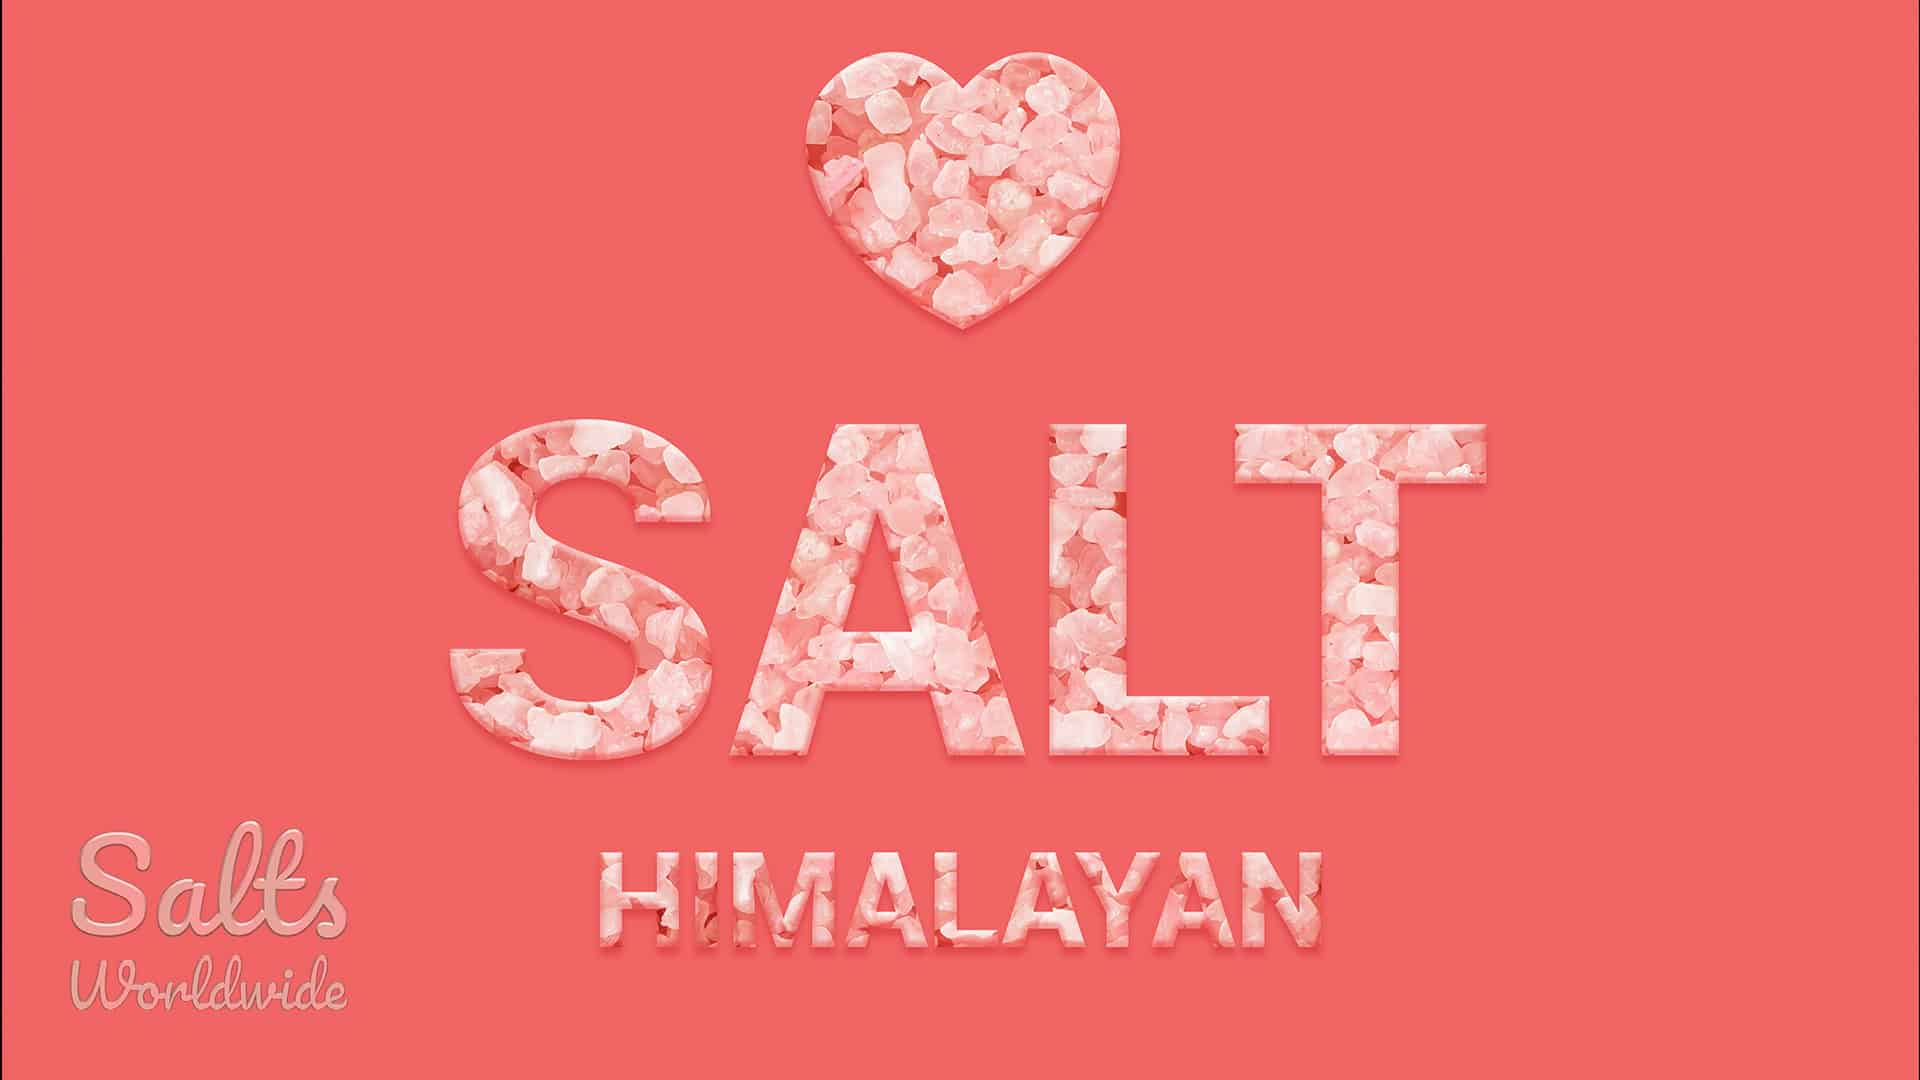 What is Pink Himalayan Salt Good For - Salt's uses